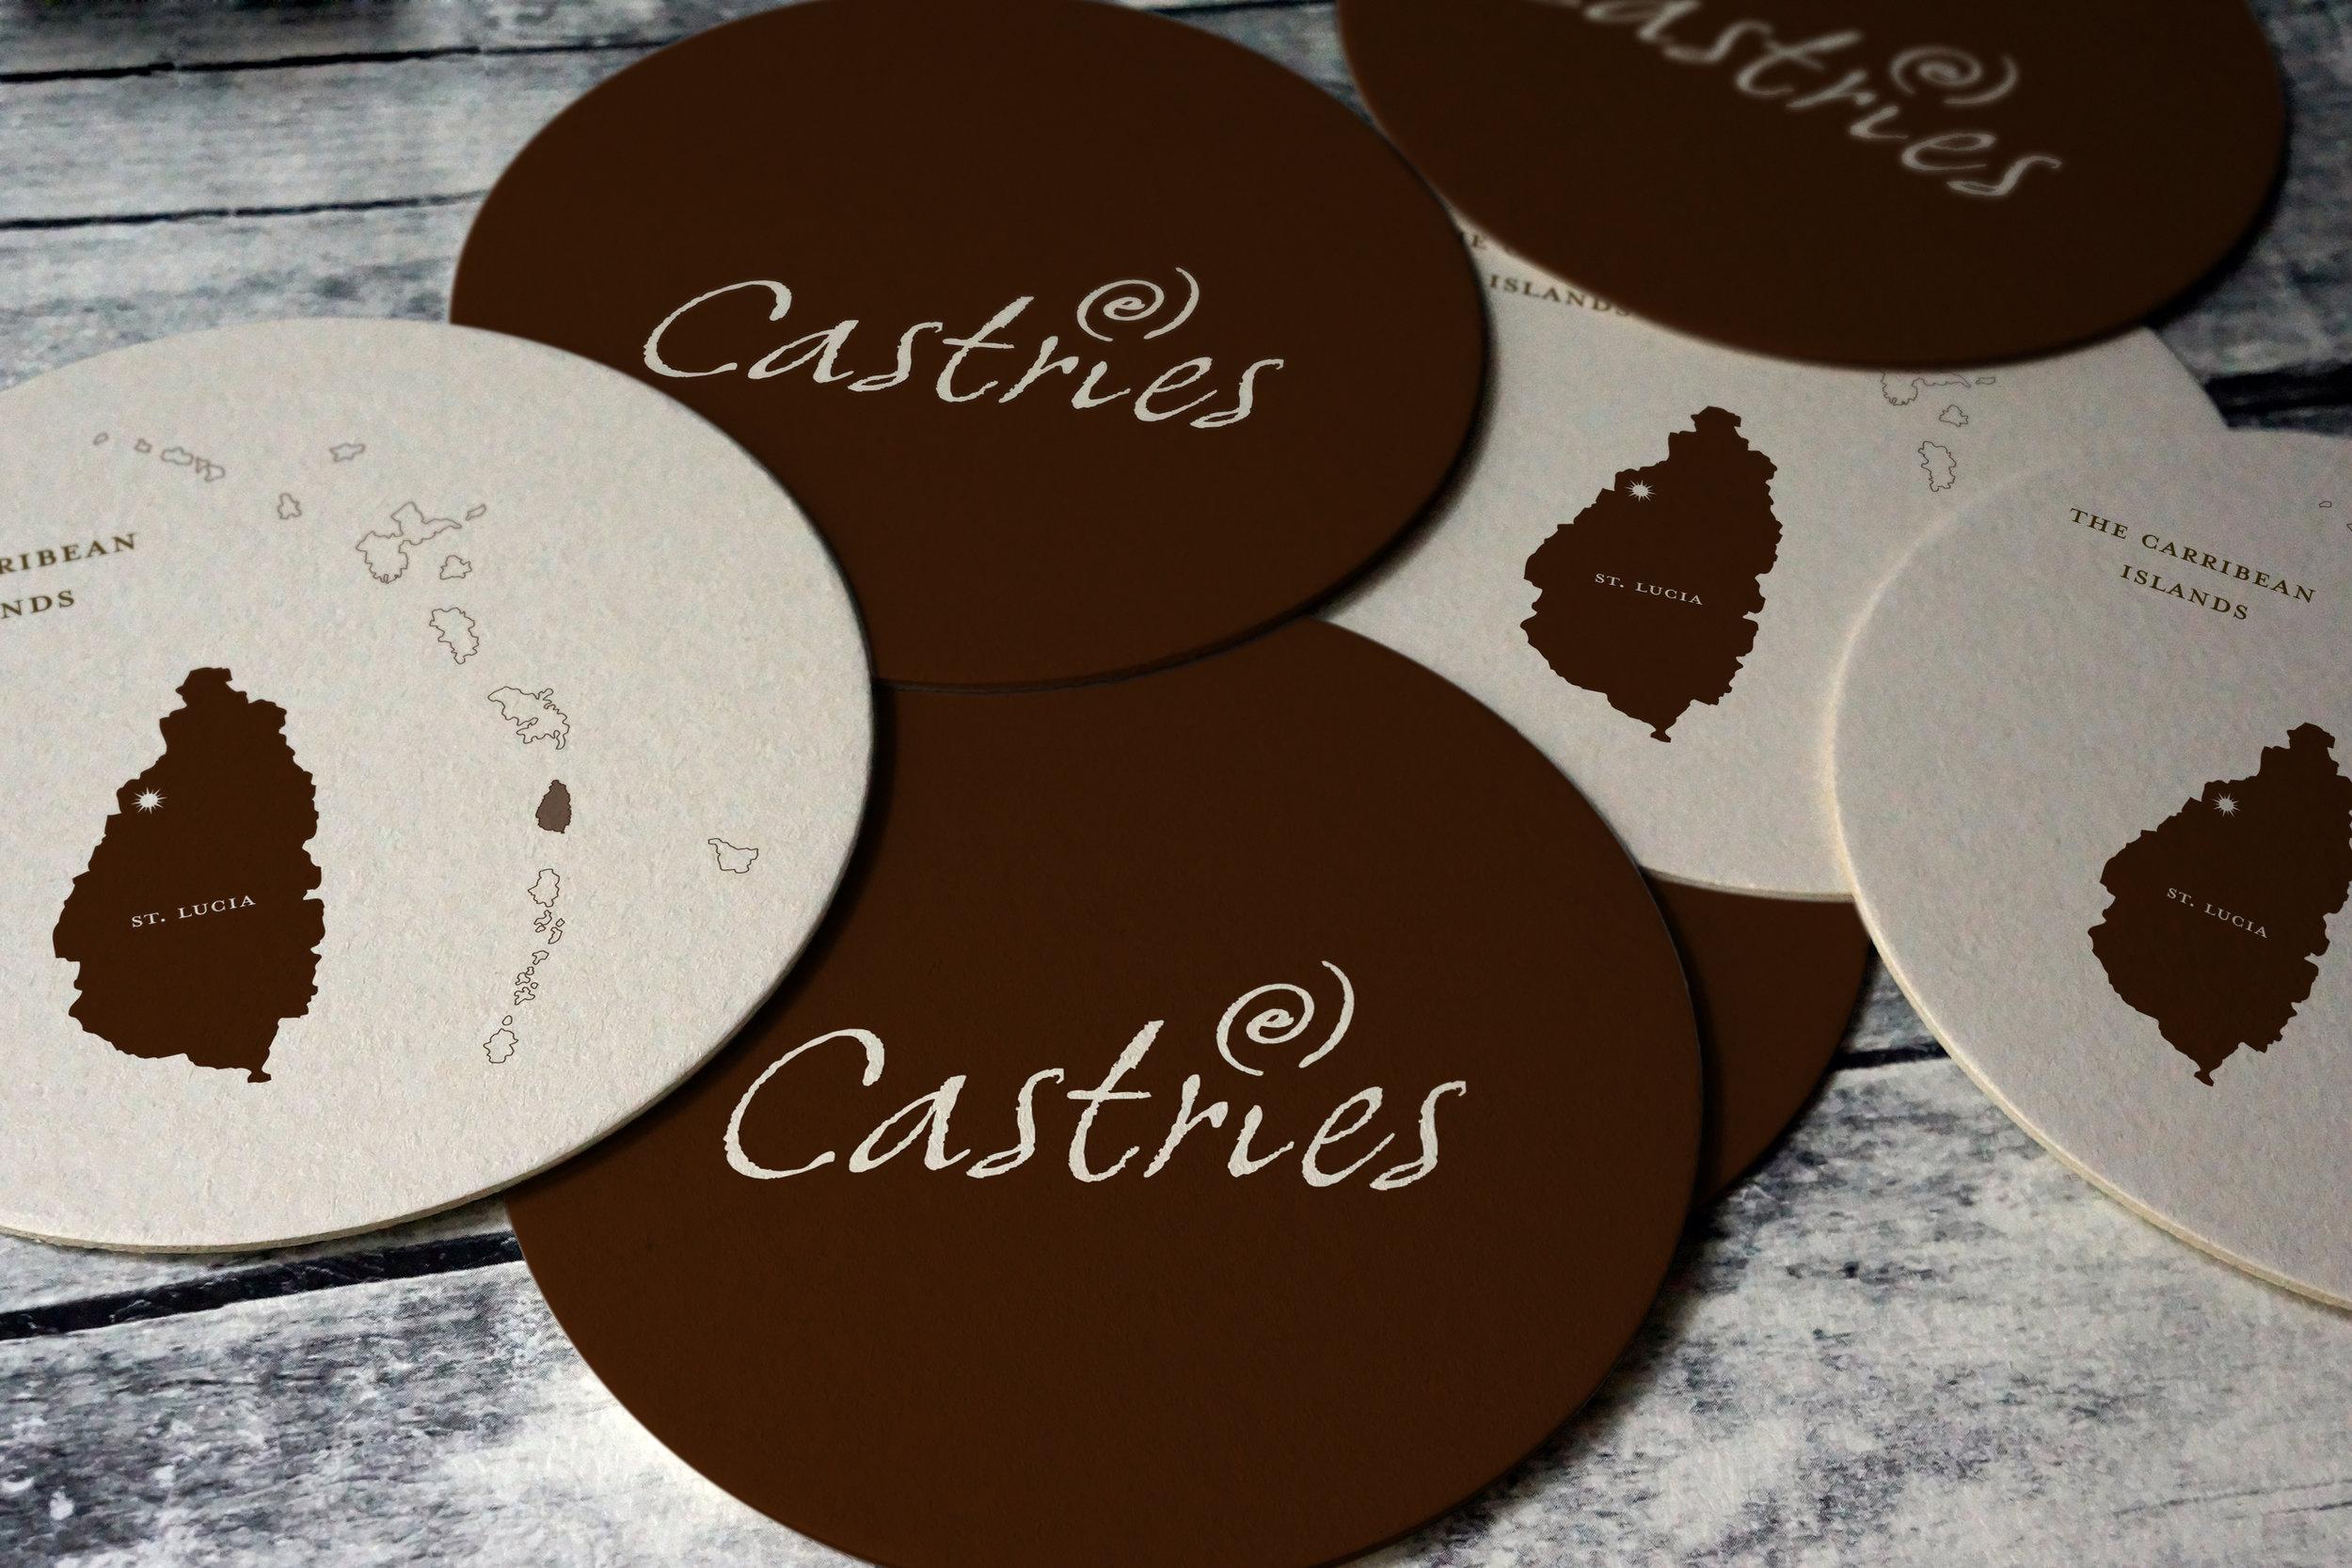 20160611_Castries Coasters.jpg